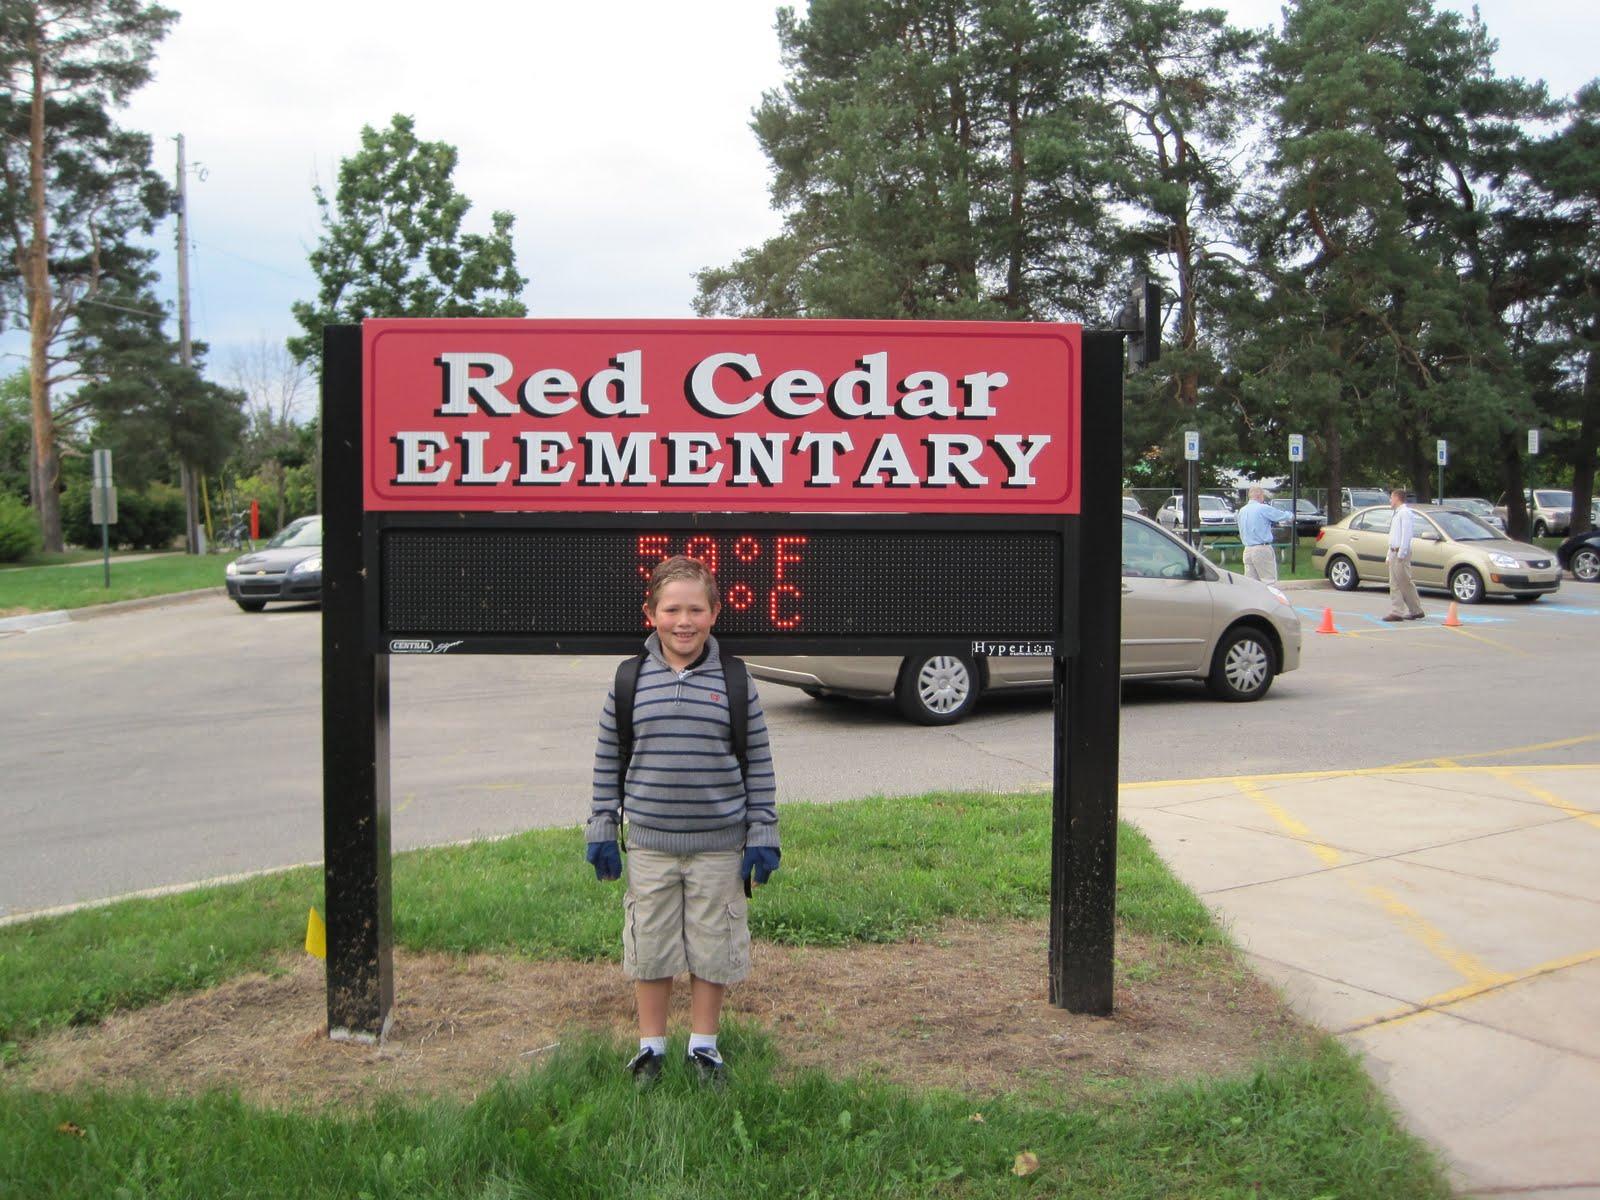 Red Cedar School ~ First day of school second grade red cedar elementary